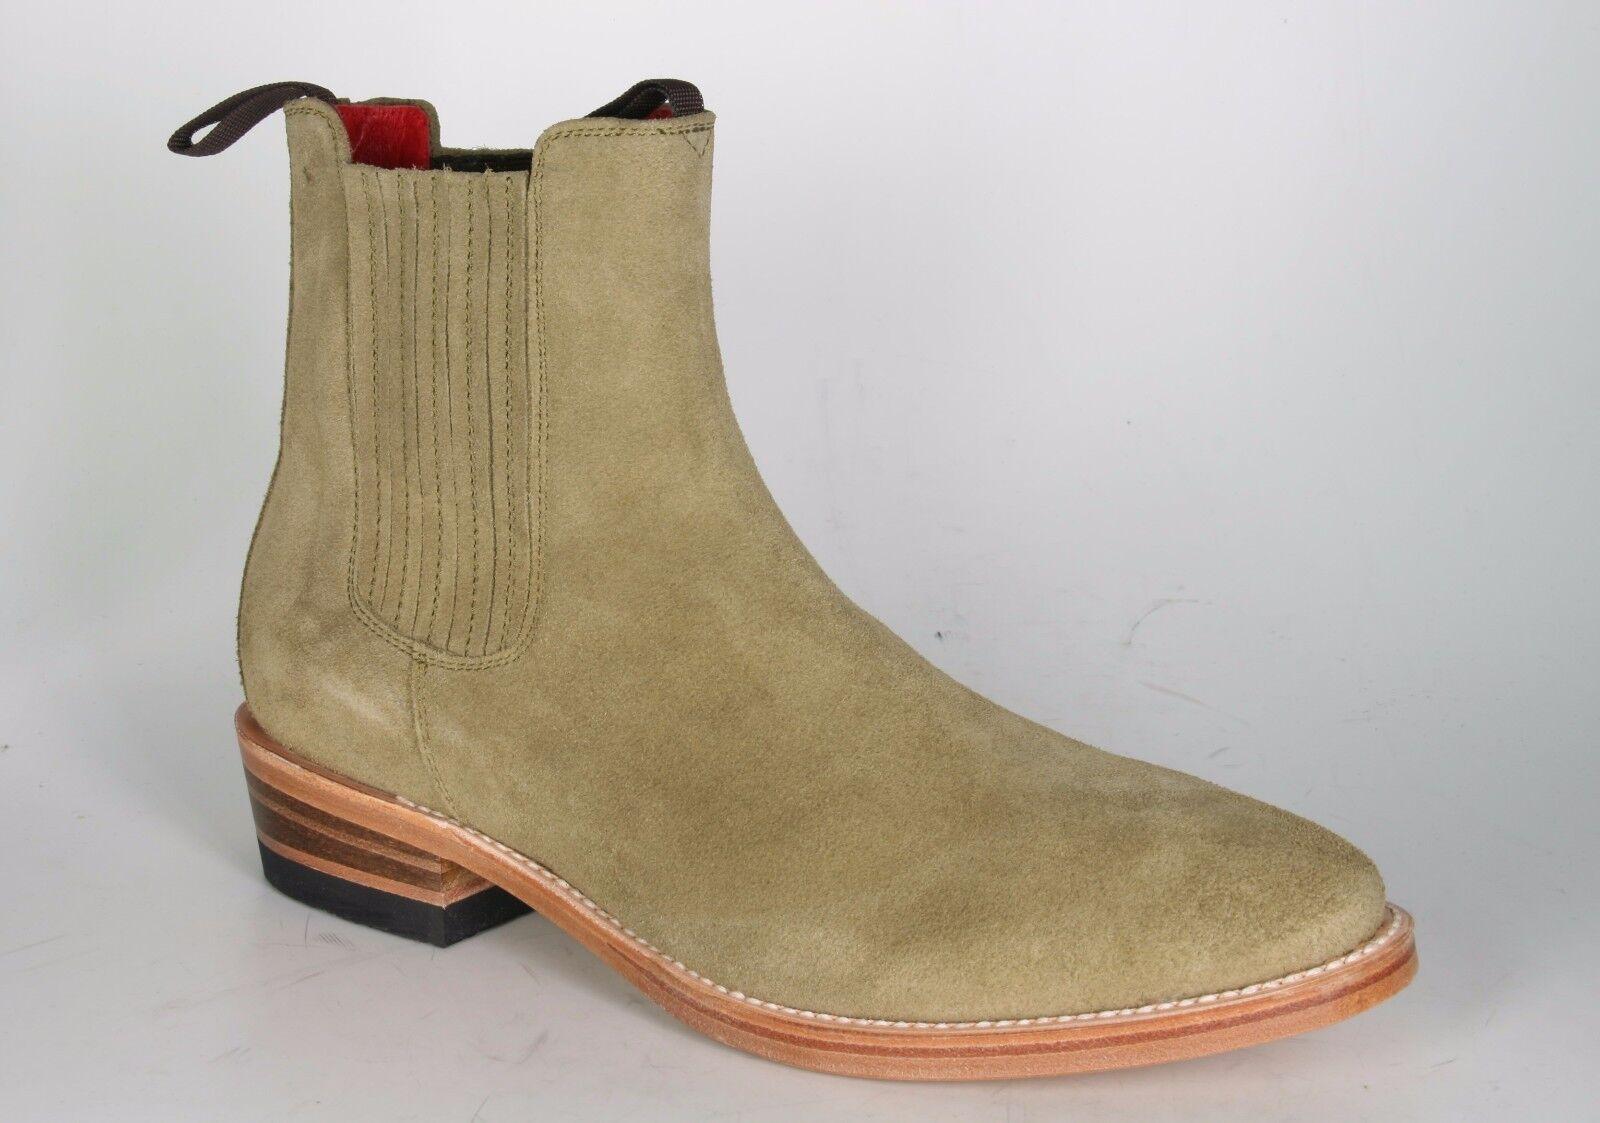 11336 sendra Bottines Kass serr. abondance Daim cadre cousue Chaussures